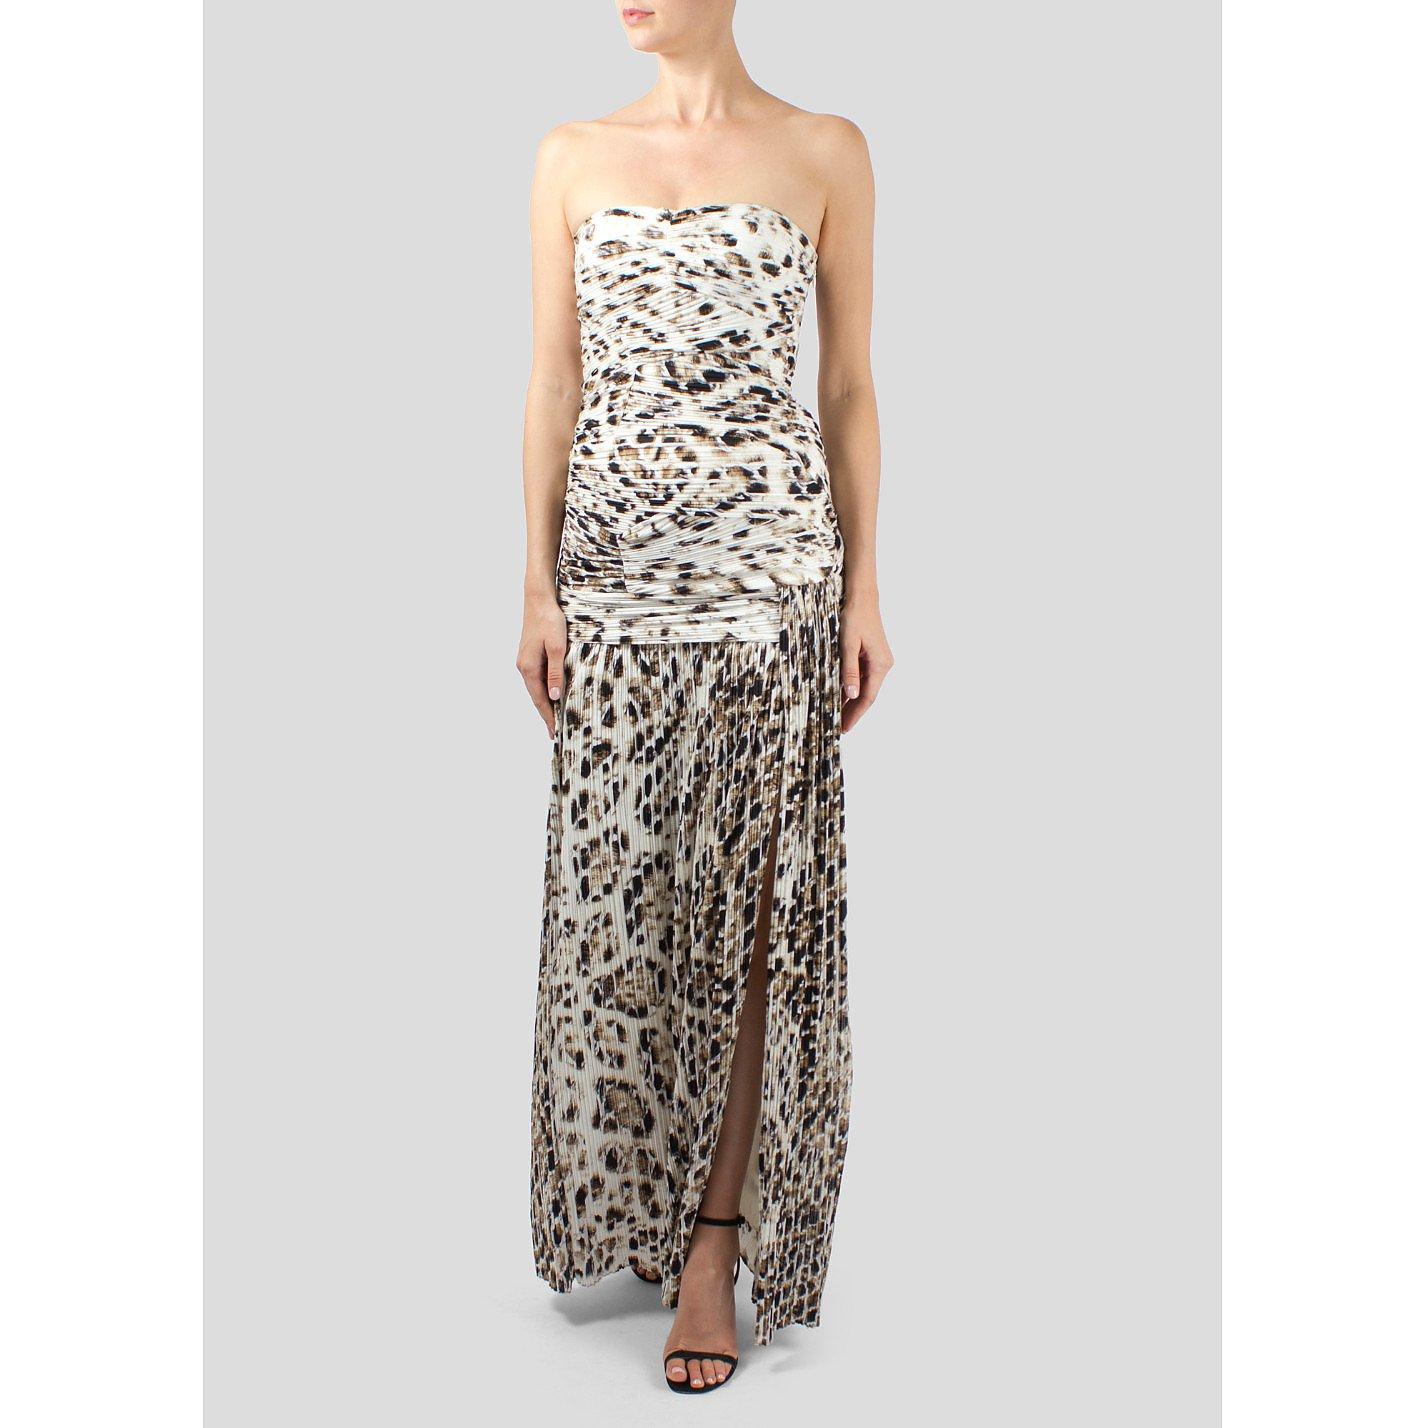 Halston Heritage Strapless Leopard Print Gown